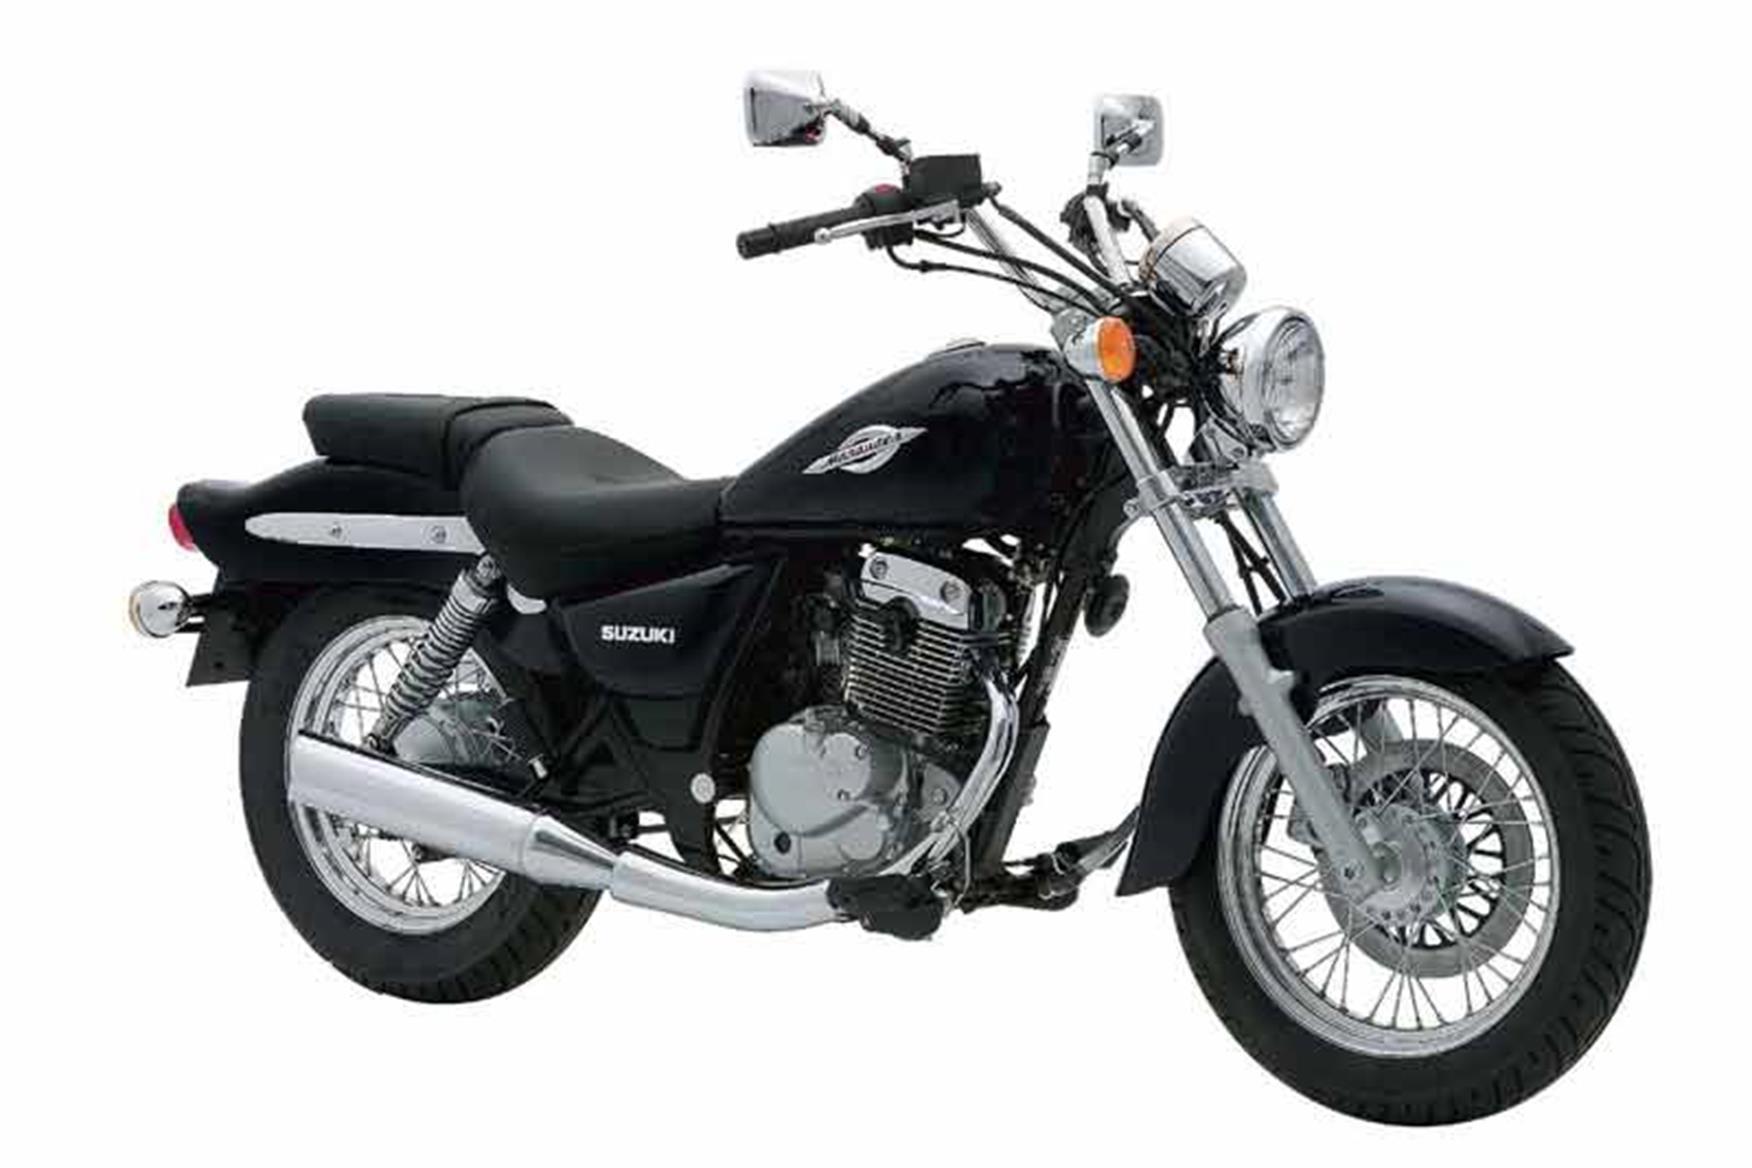 New Suzuki GZ 125 K2 Marauder 02 125cc Indicator Front Right or Rear Left Side